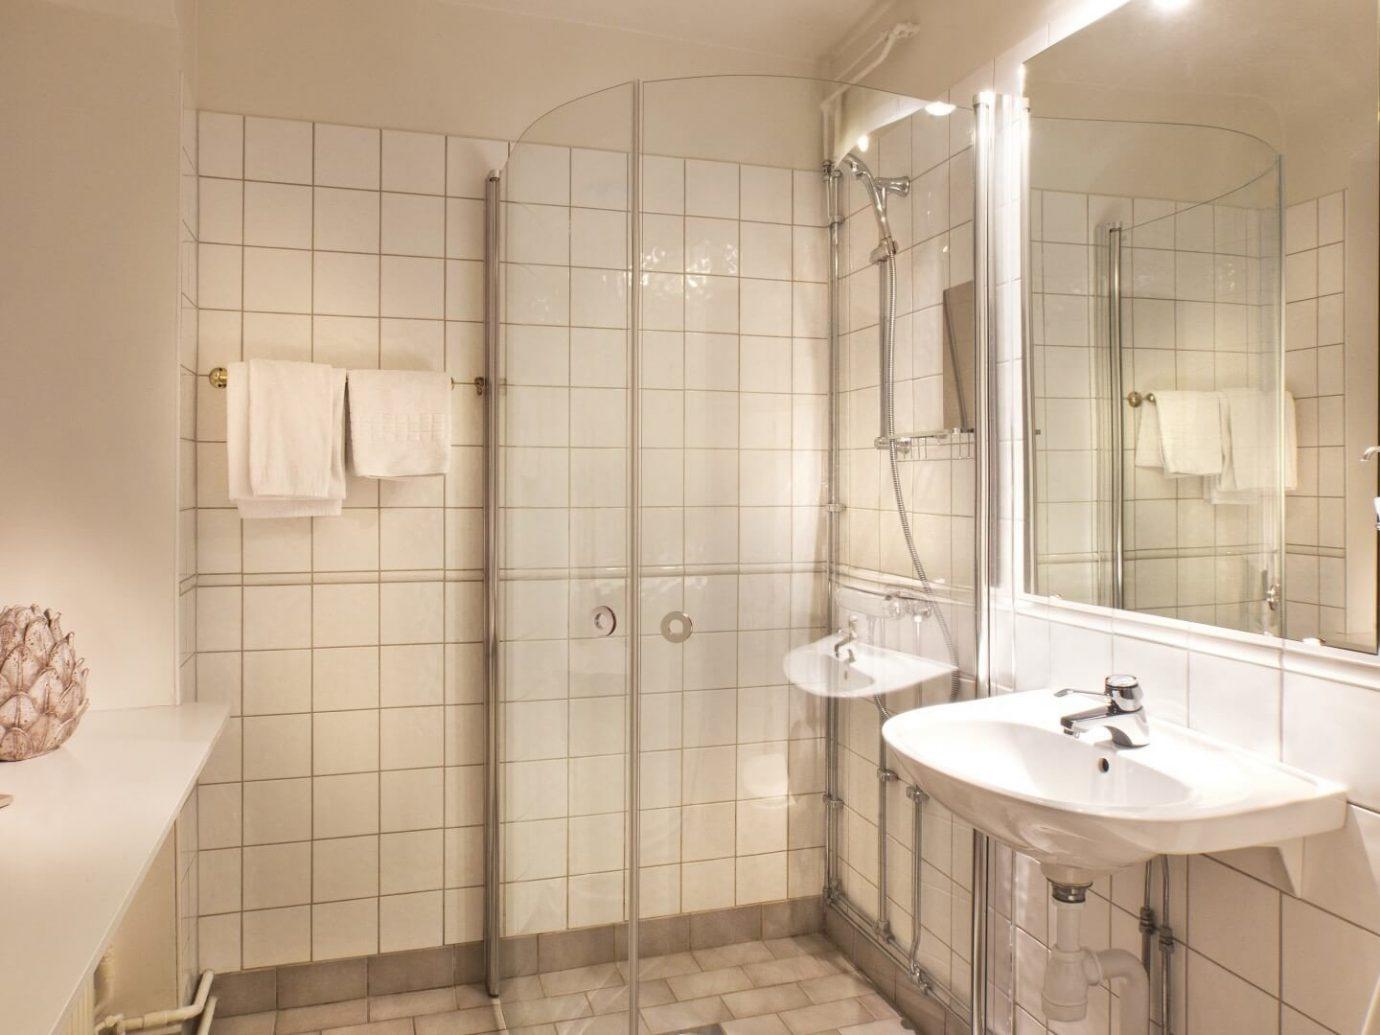 Denmark Finland Hotels Landmarks Luxury Travel Sweden bathroom indoor wall room property sink mirror interior design toilet home tile product design plumbing fixture floor interior designer tan tiled